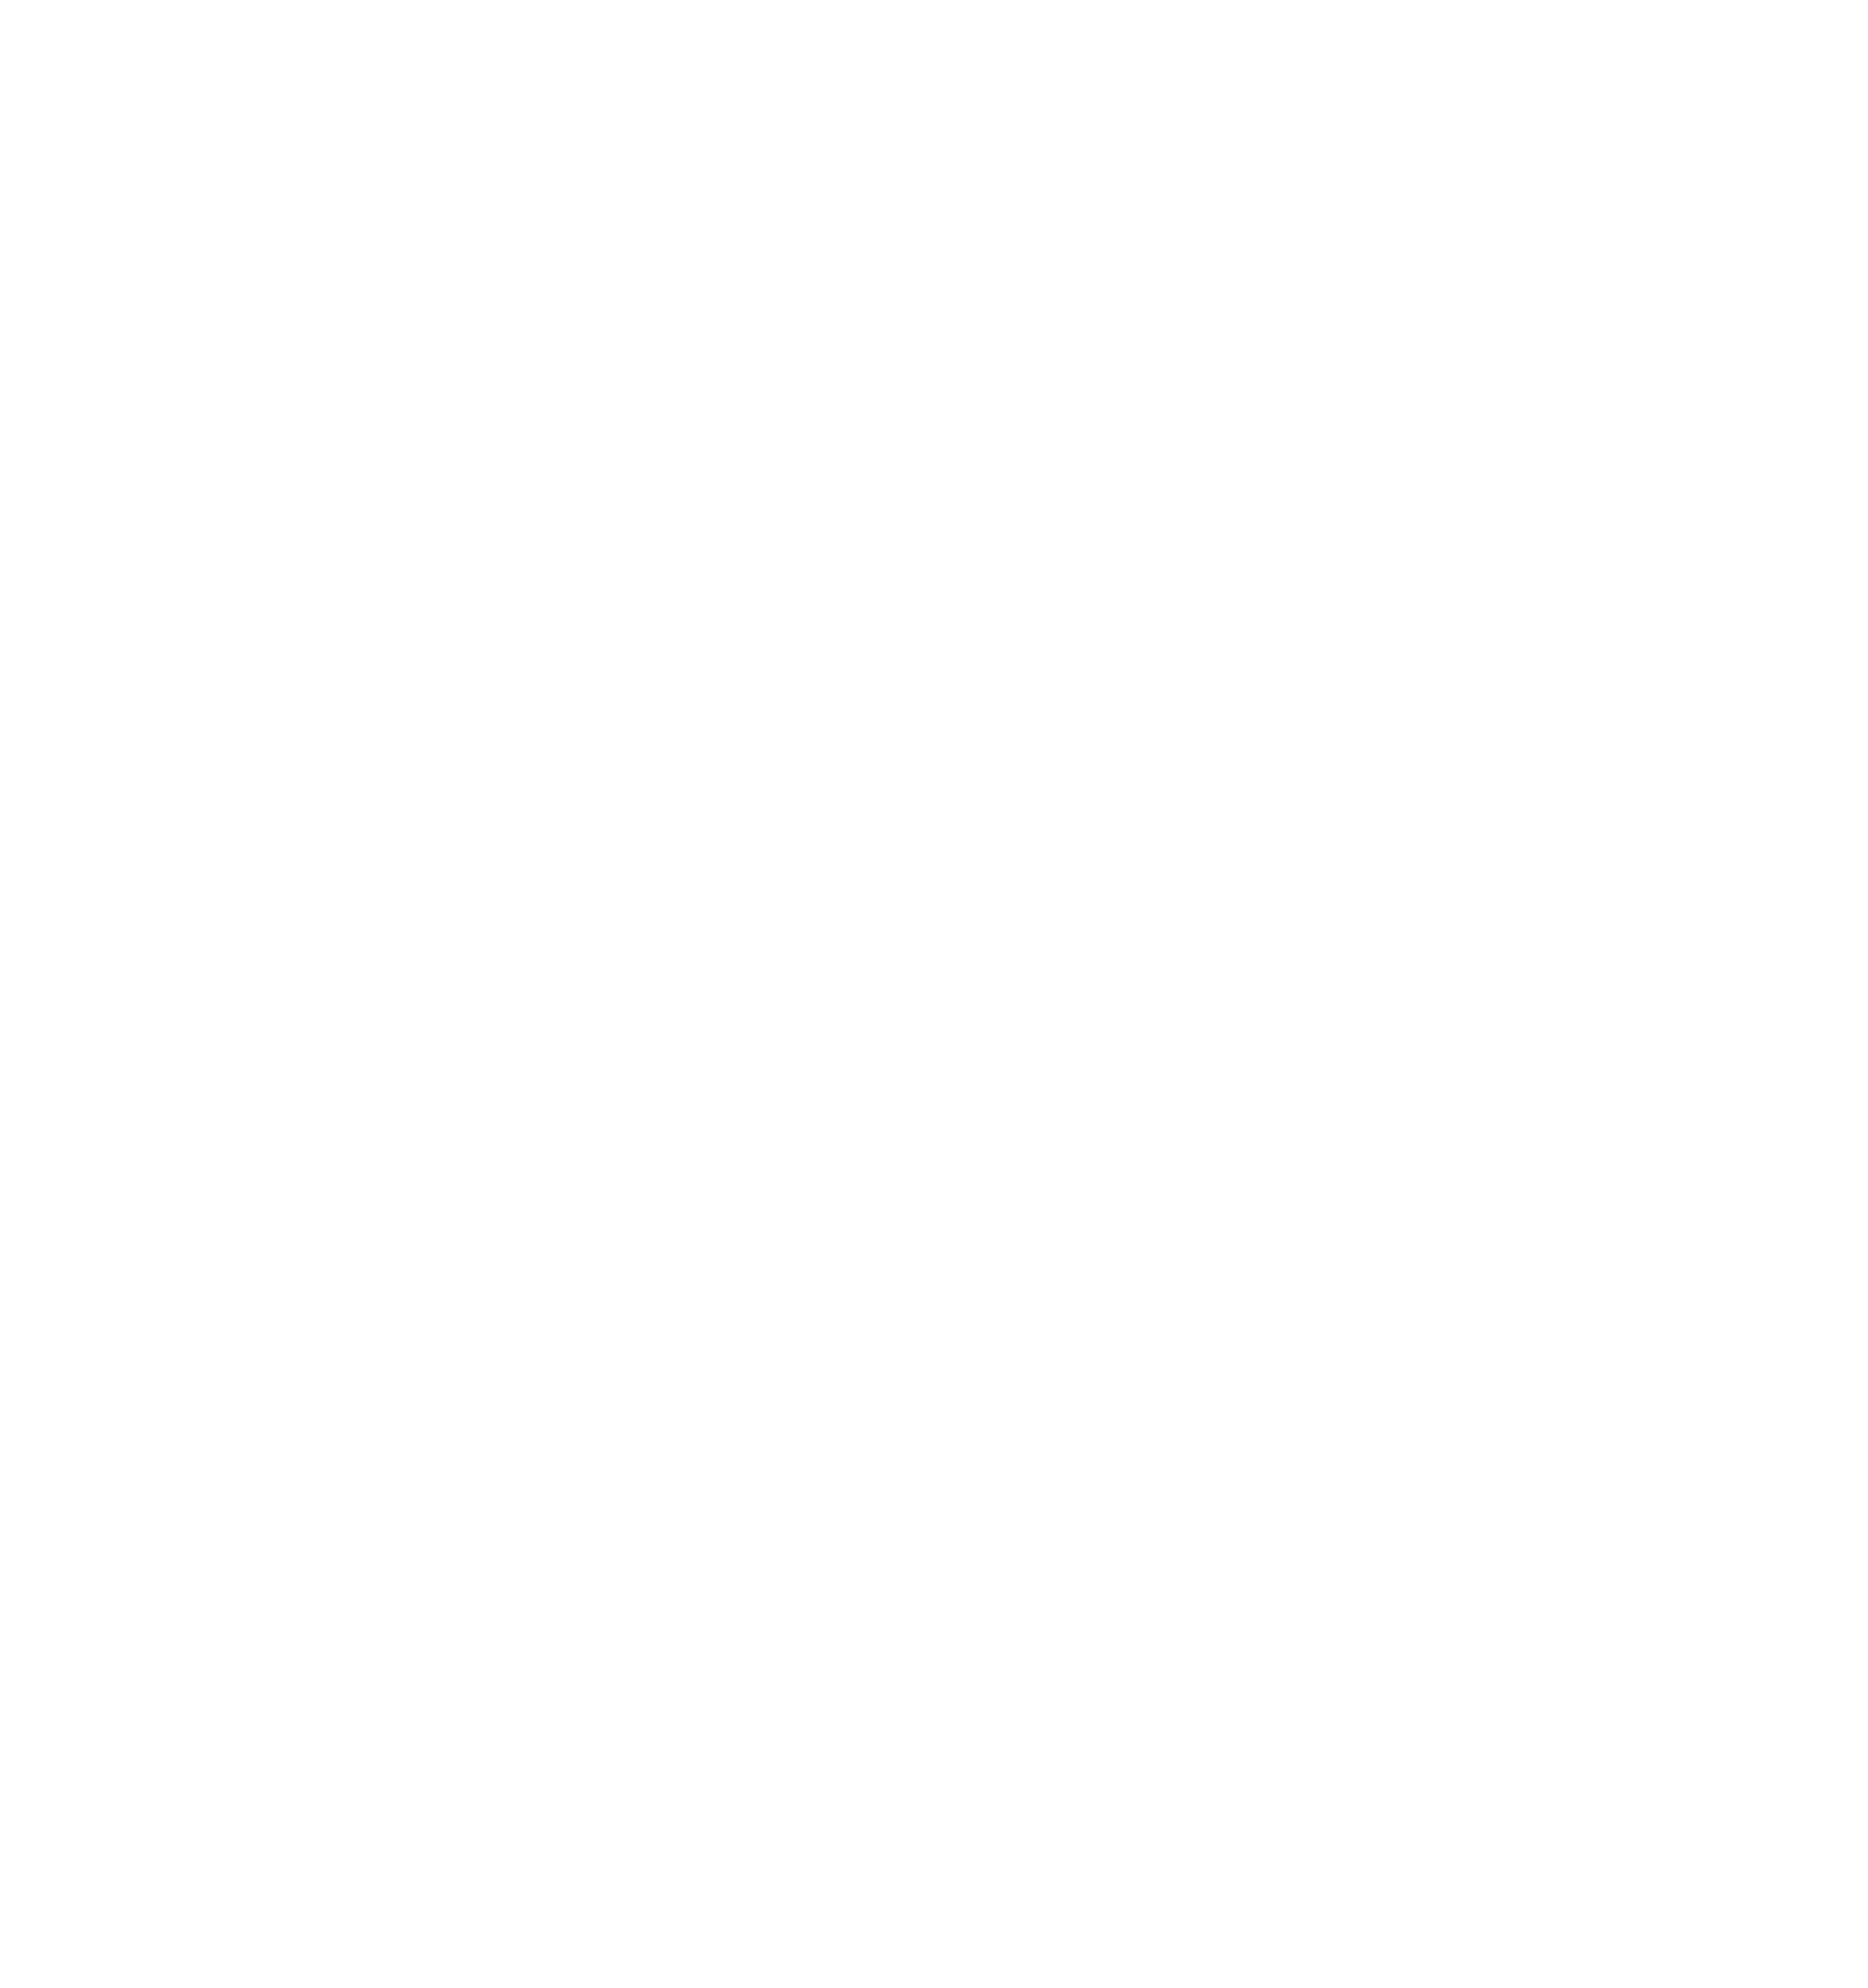 Federatie Tilburgse Zangverenigingen